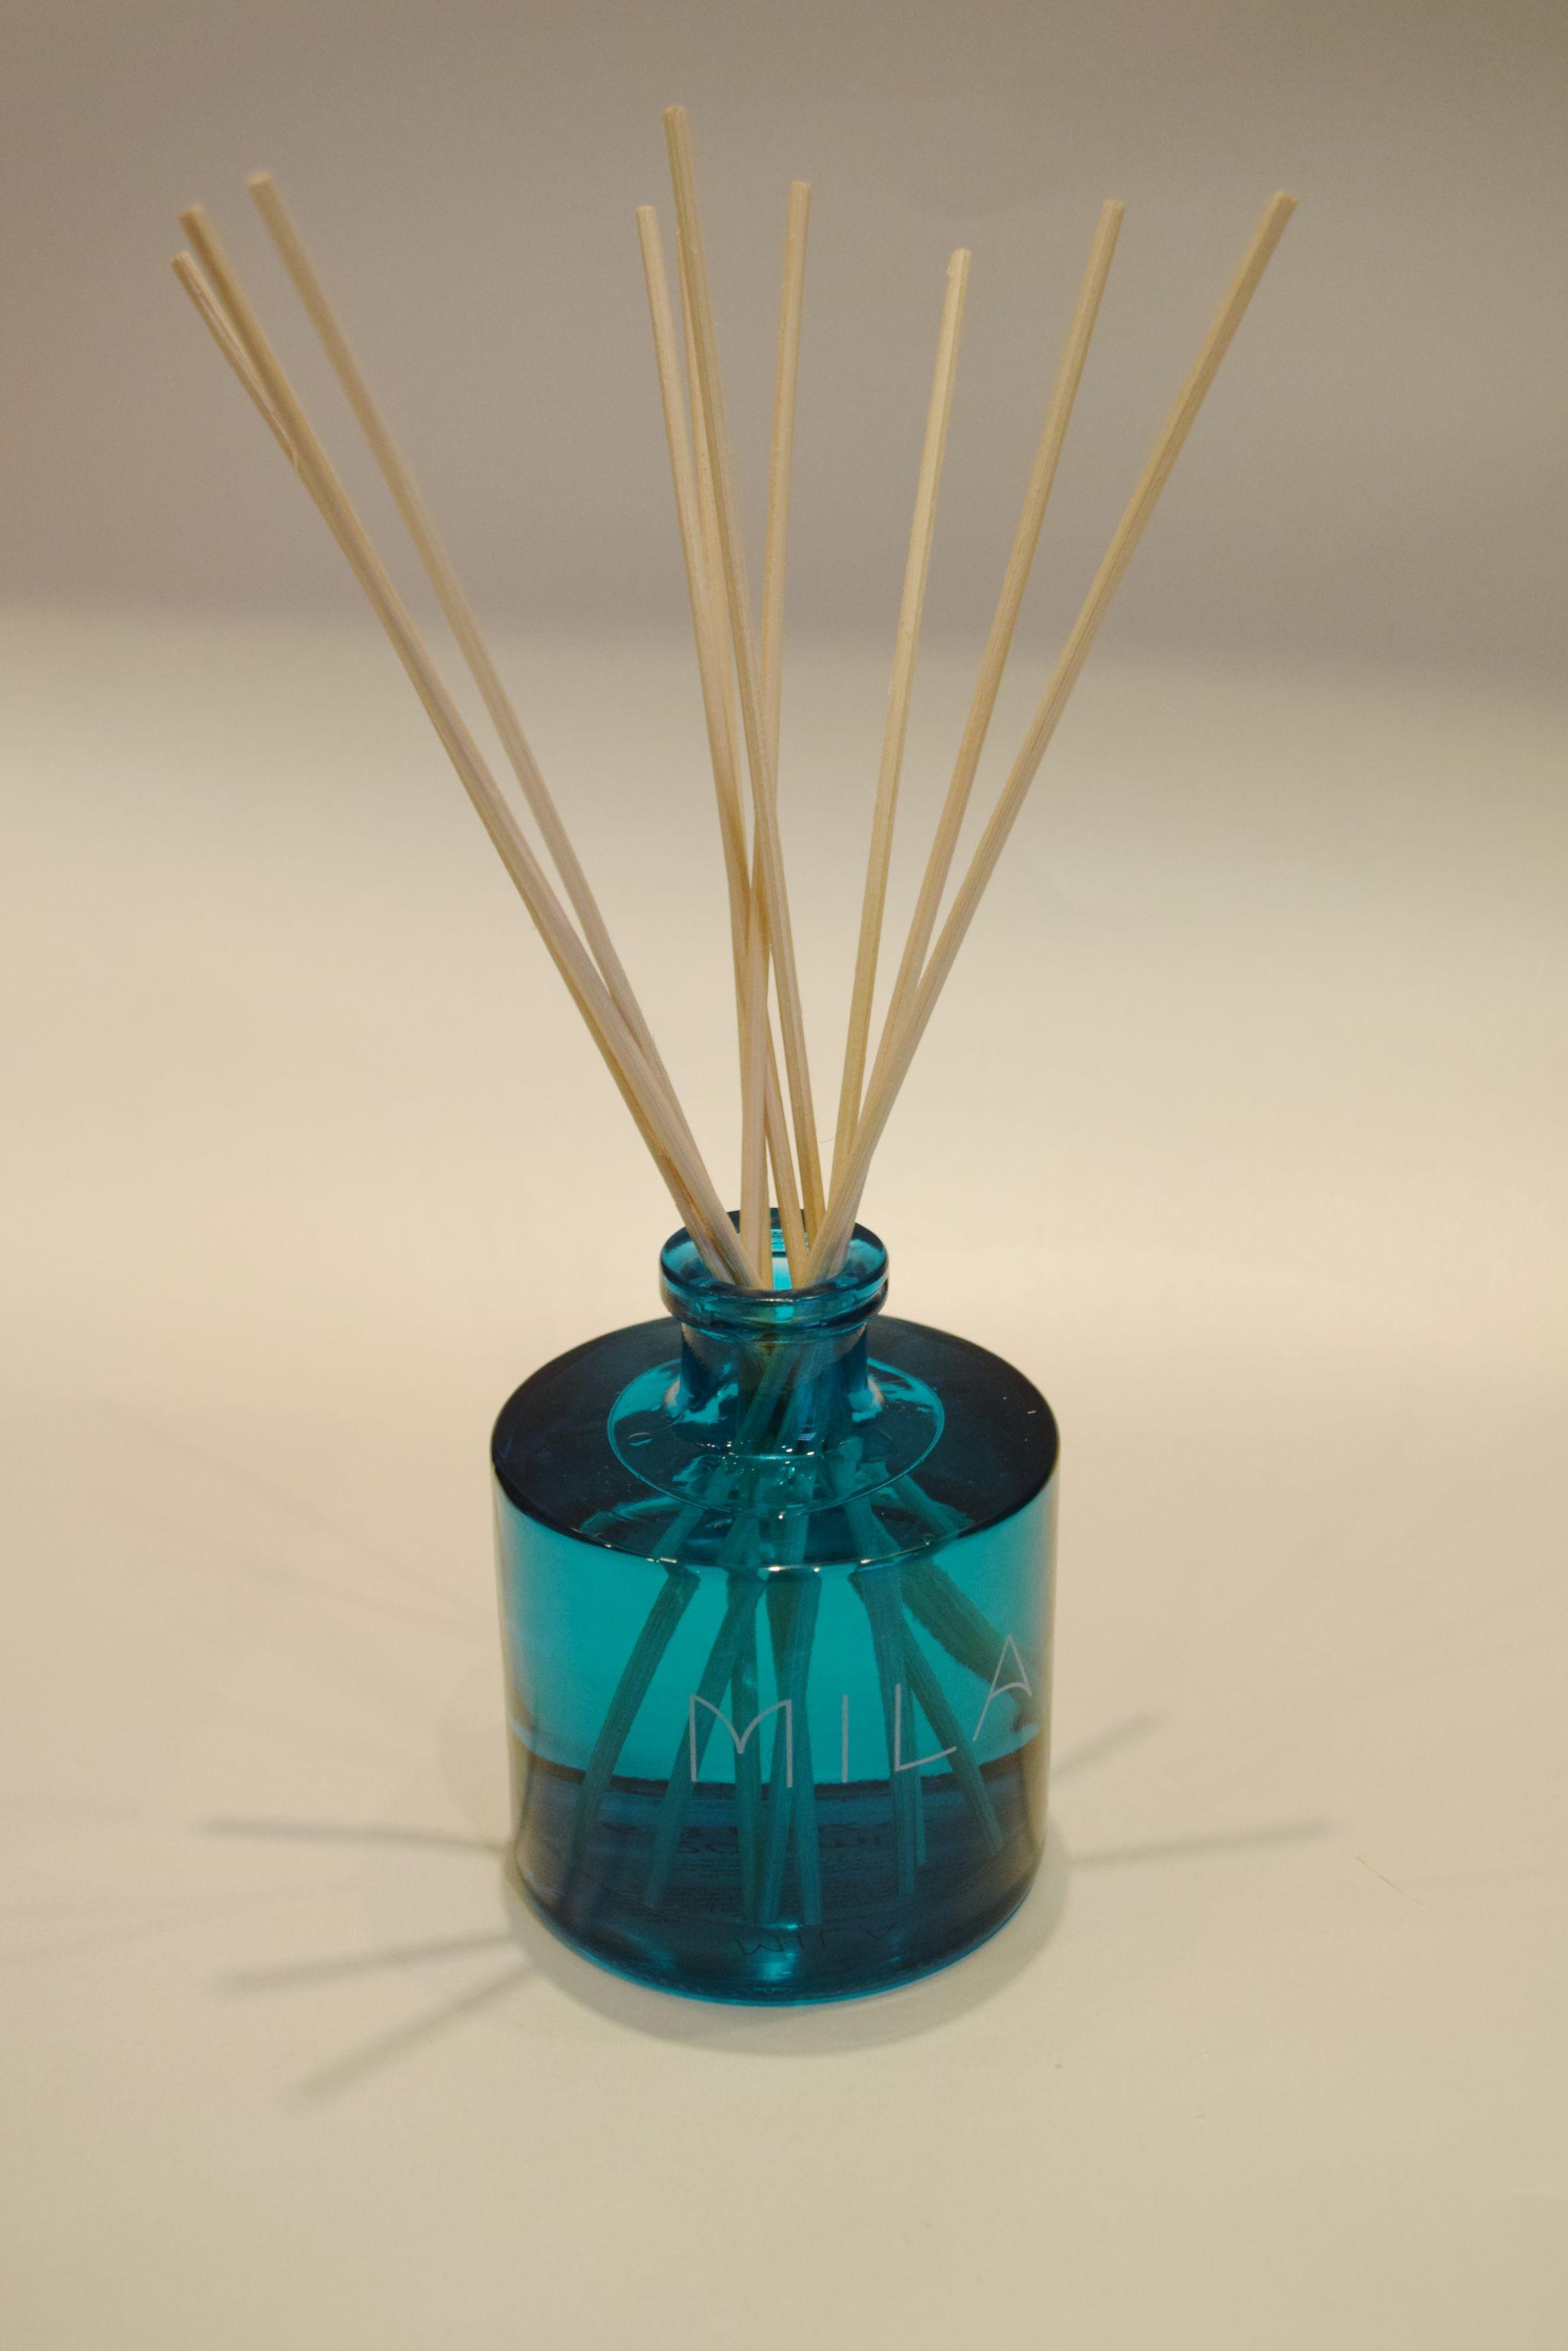 Mila Chiara Fragrance Diffuser2